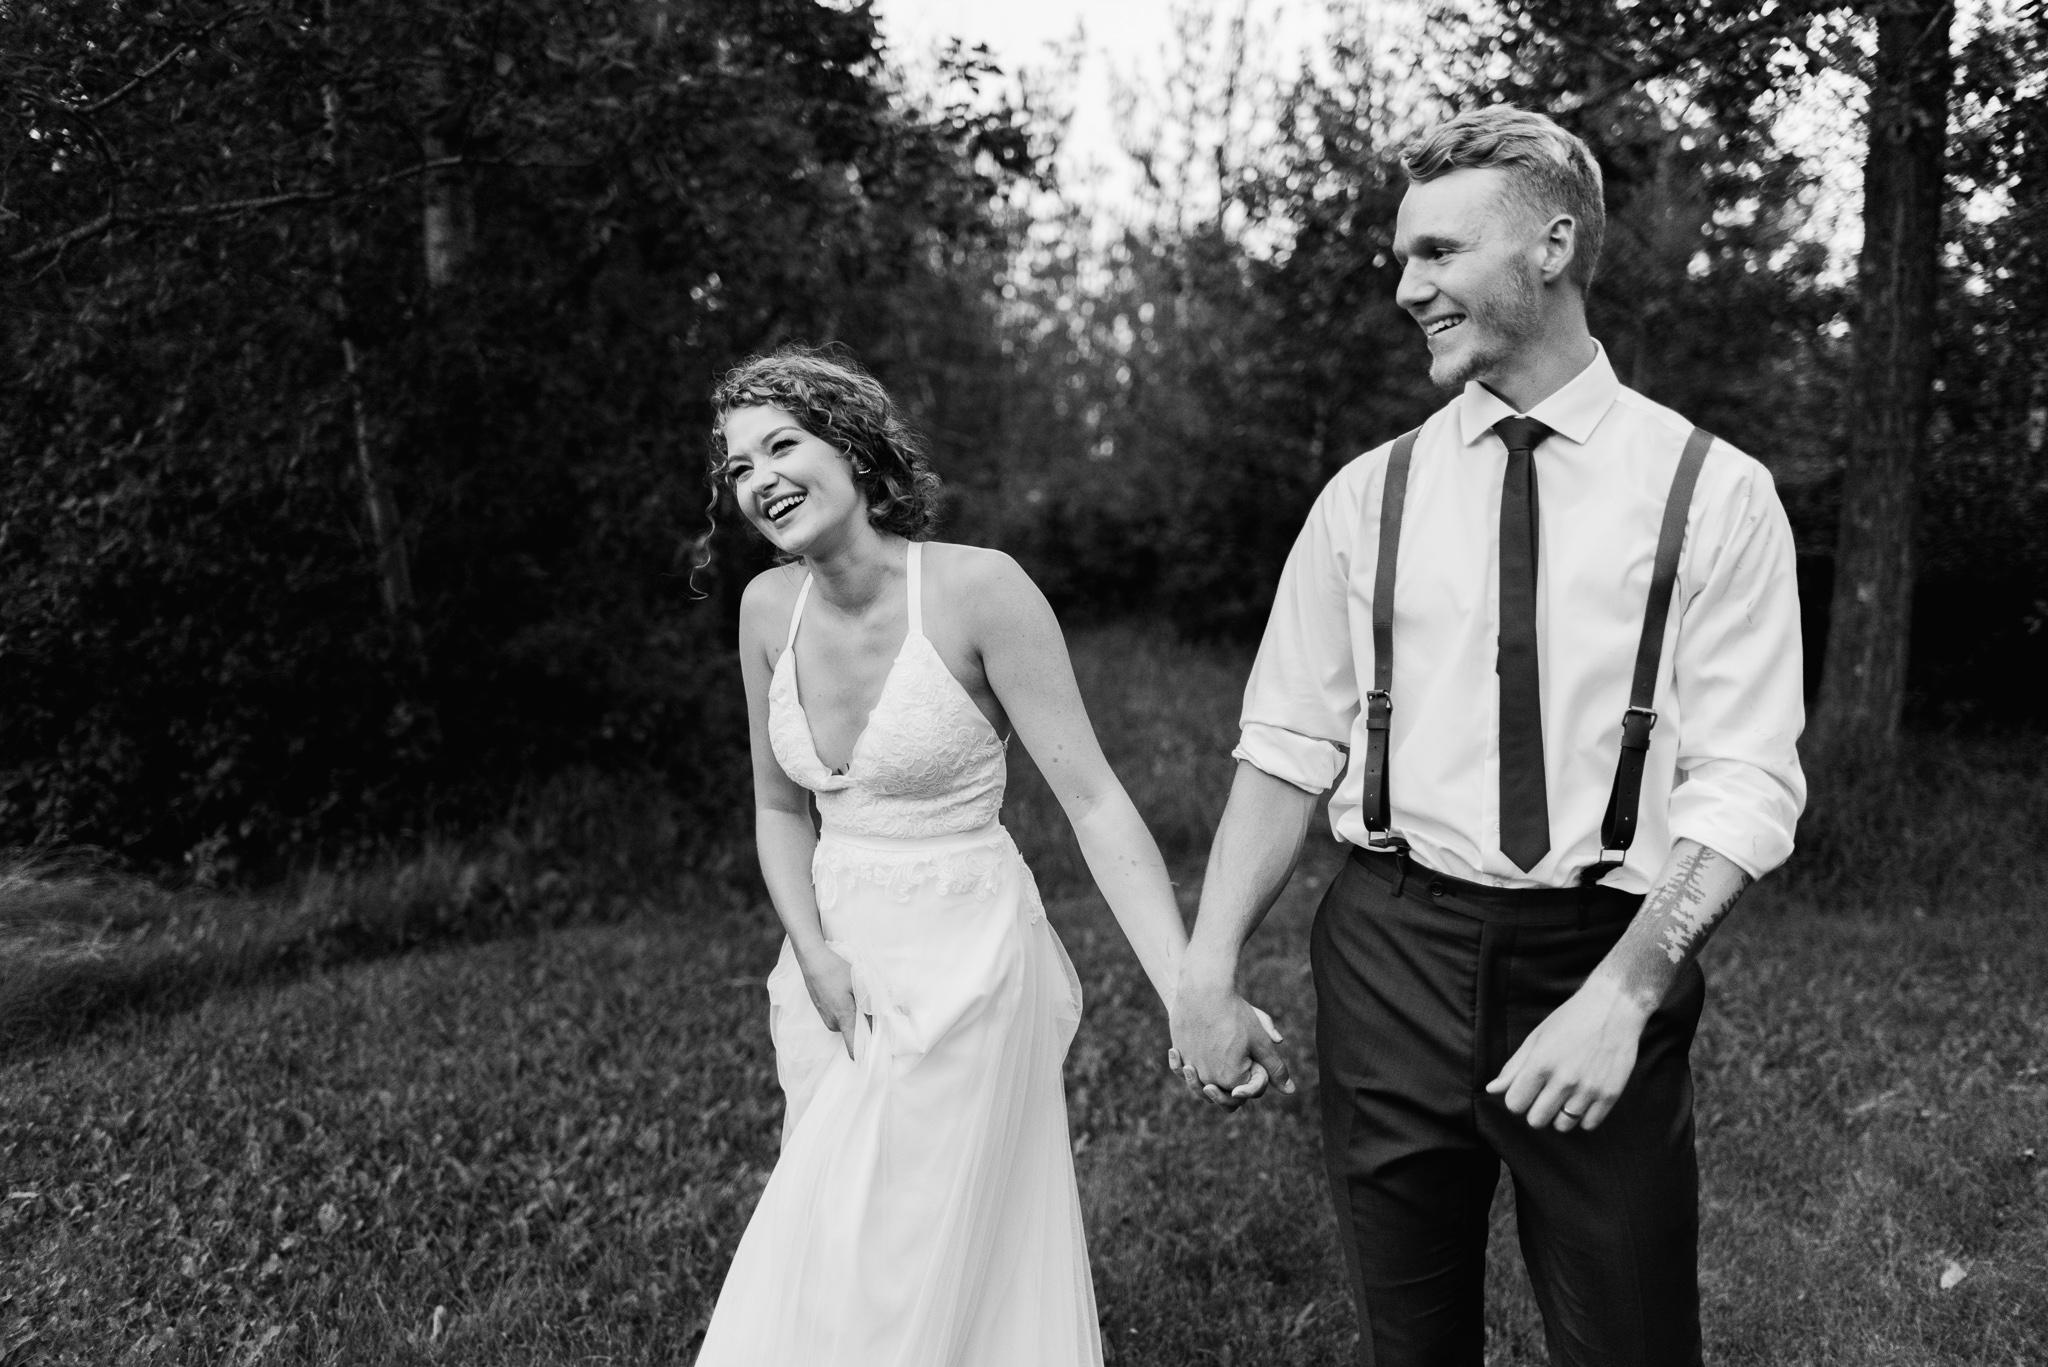 J&C-Weddingblog-113.jpg